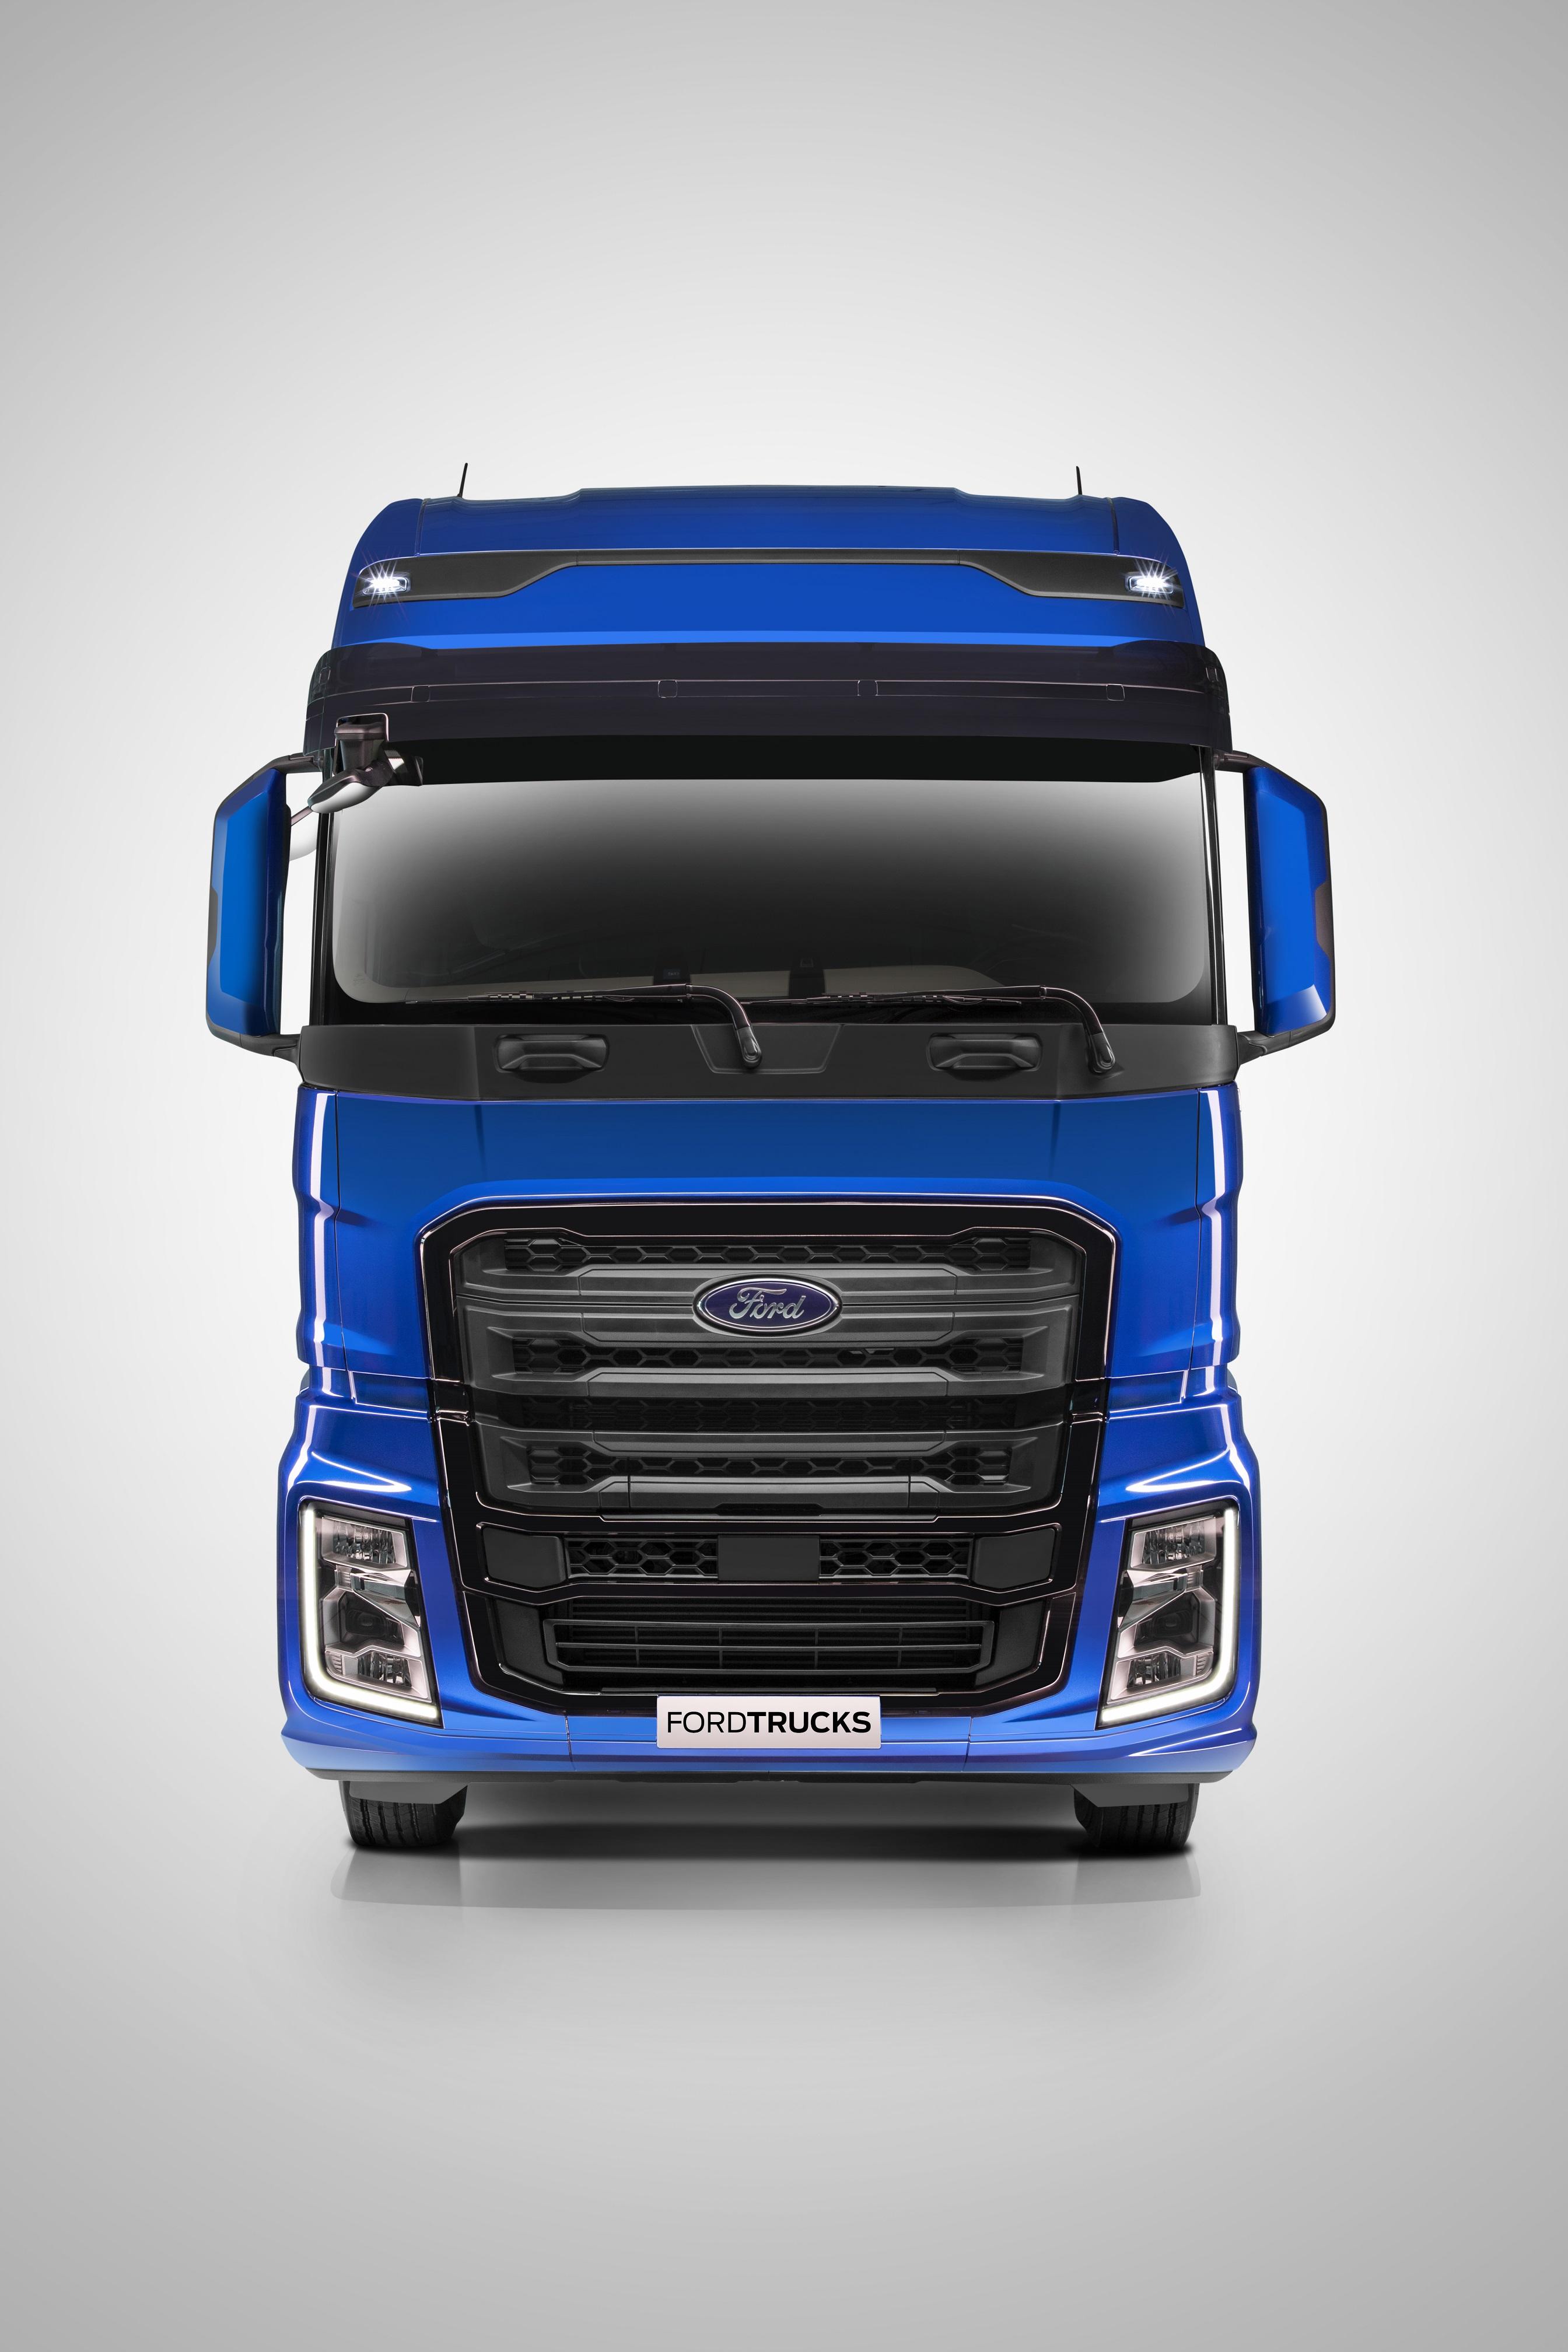 1532513425_Ford_Trucks_Yeni___ekici__2_